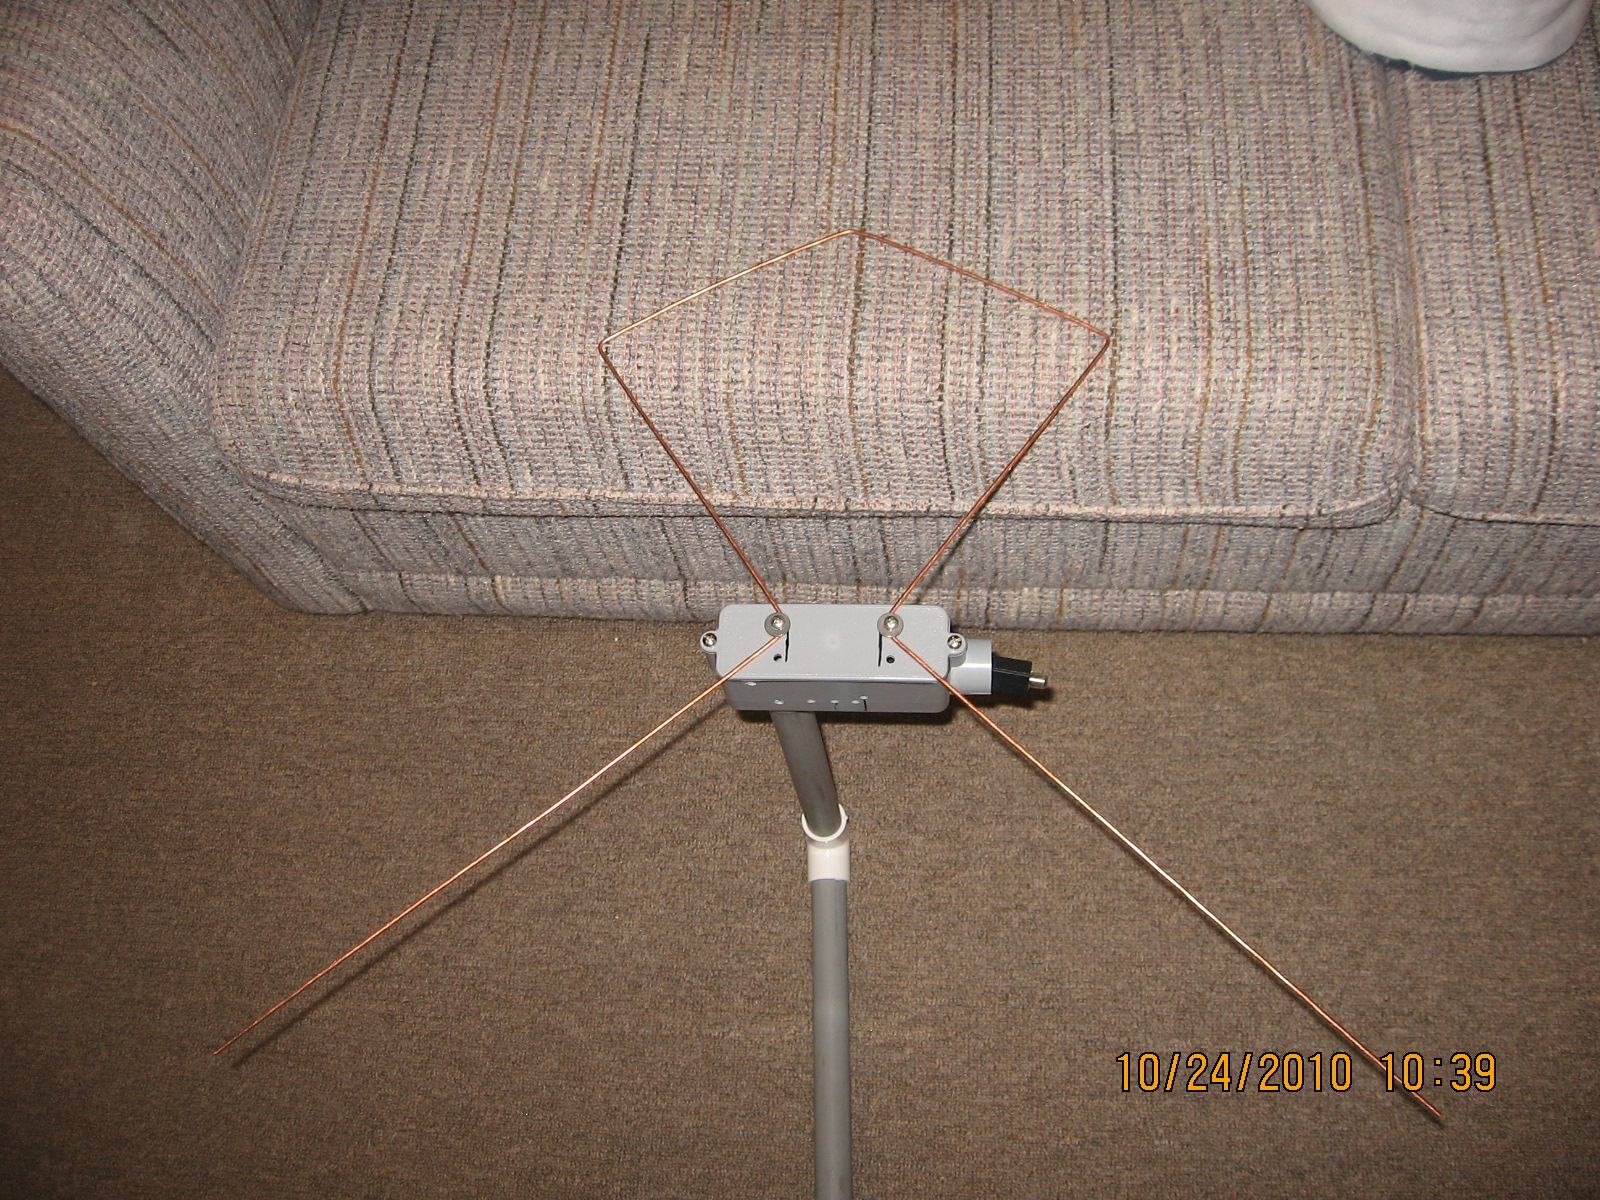 Hdtv Antenna Wiring Diagram Library Tv